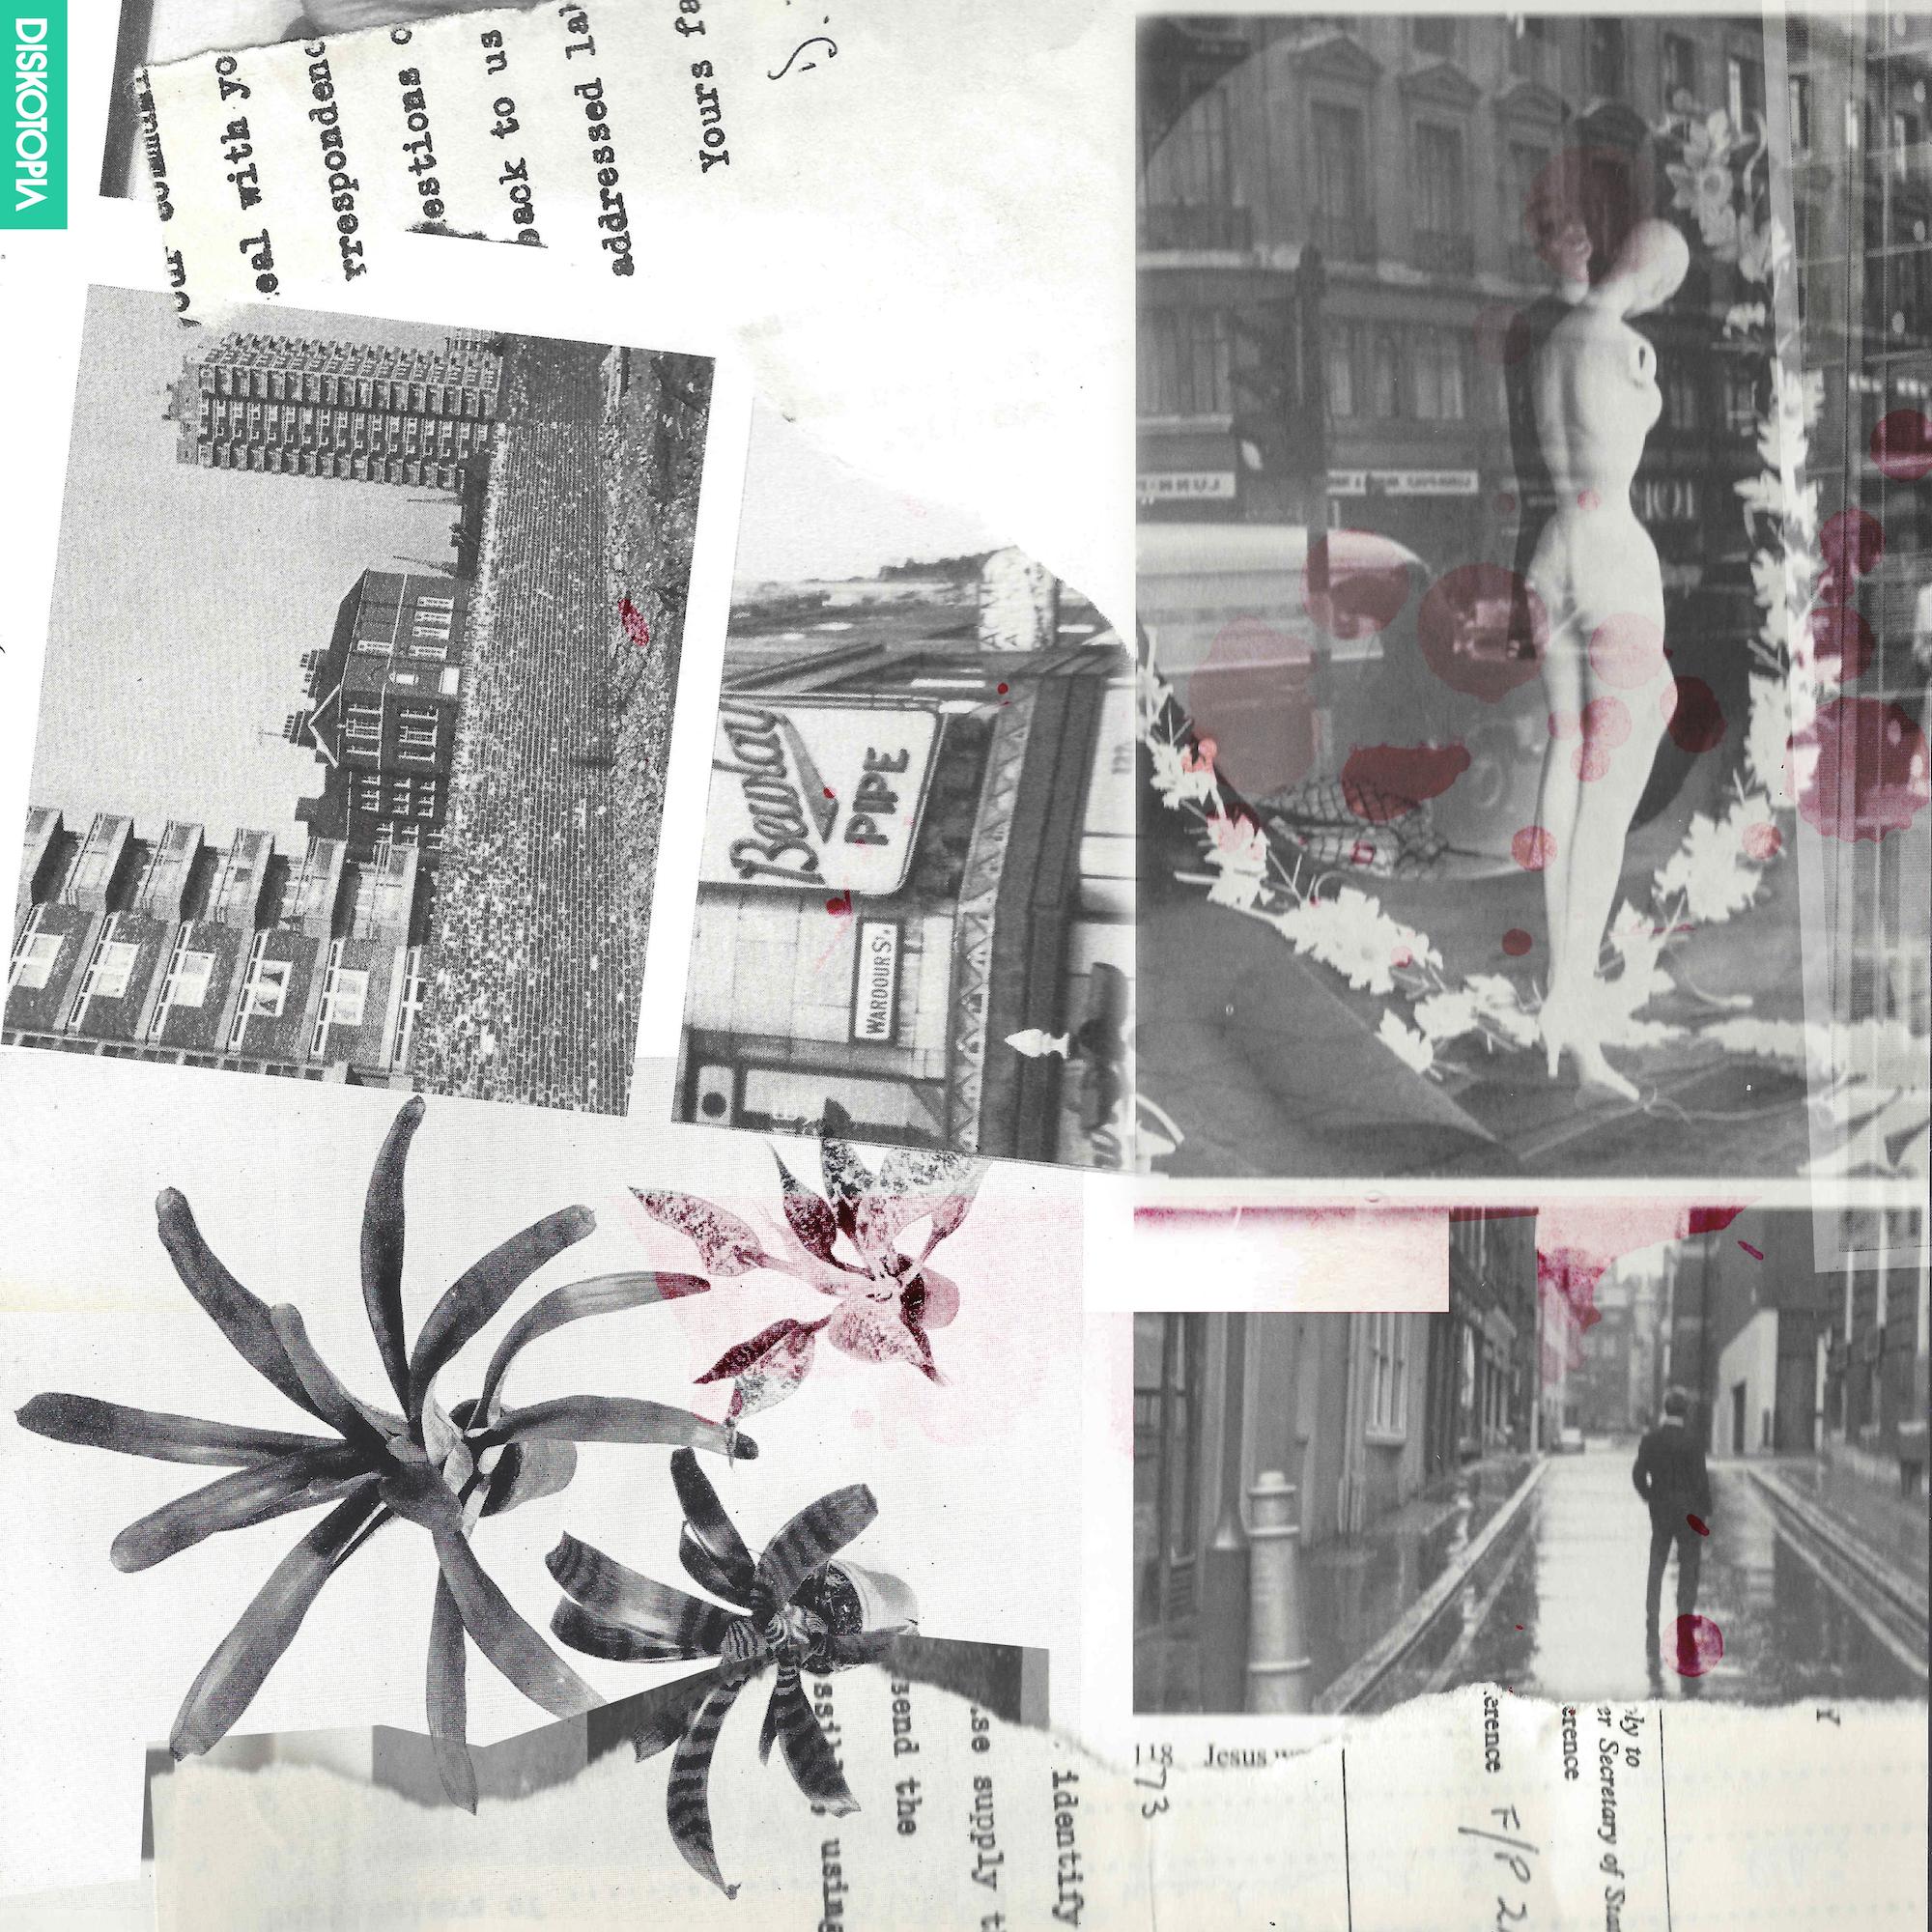 BD1982 - Arclight EP artwork